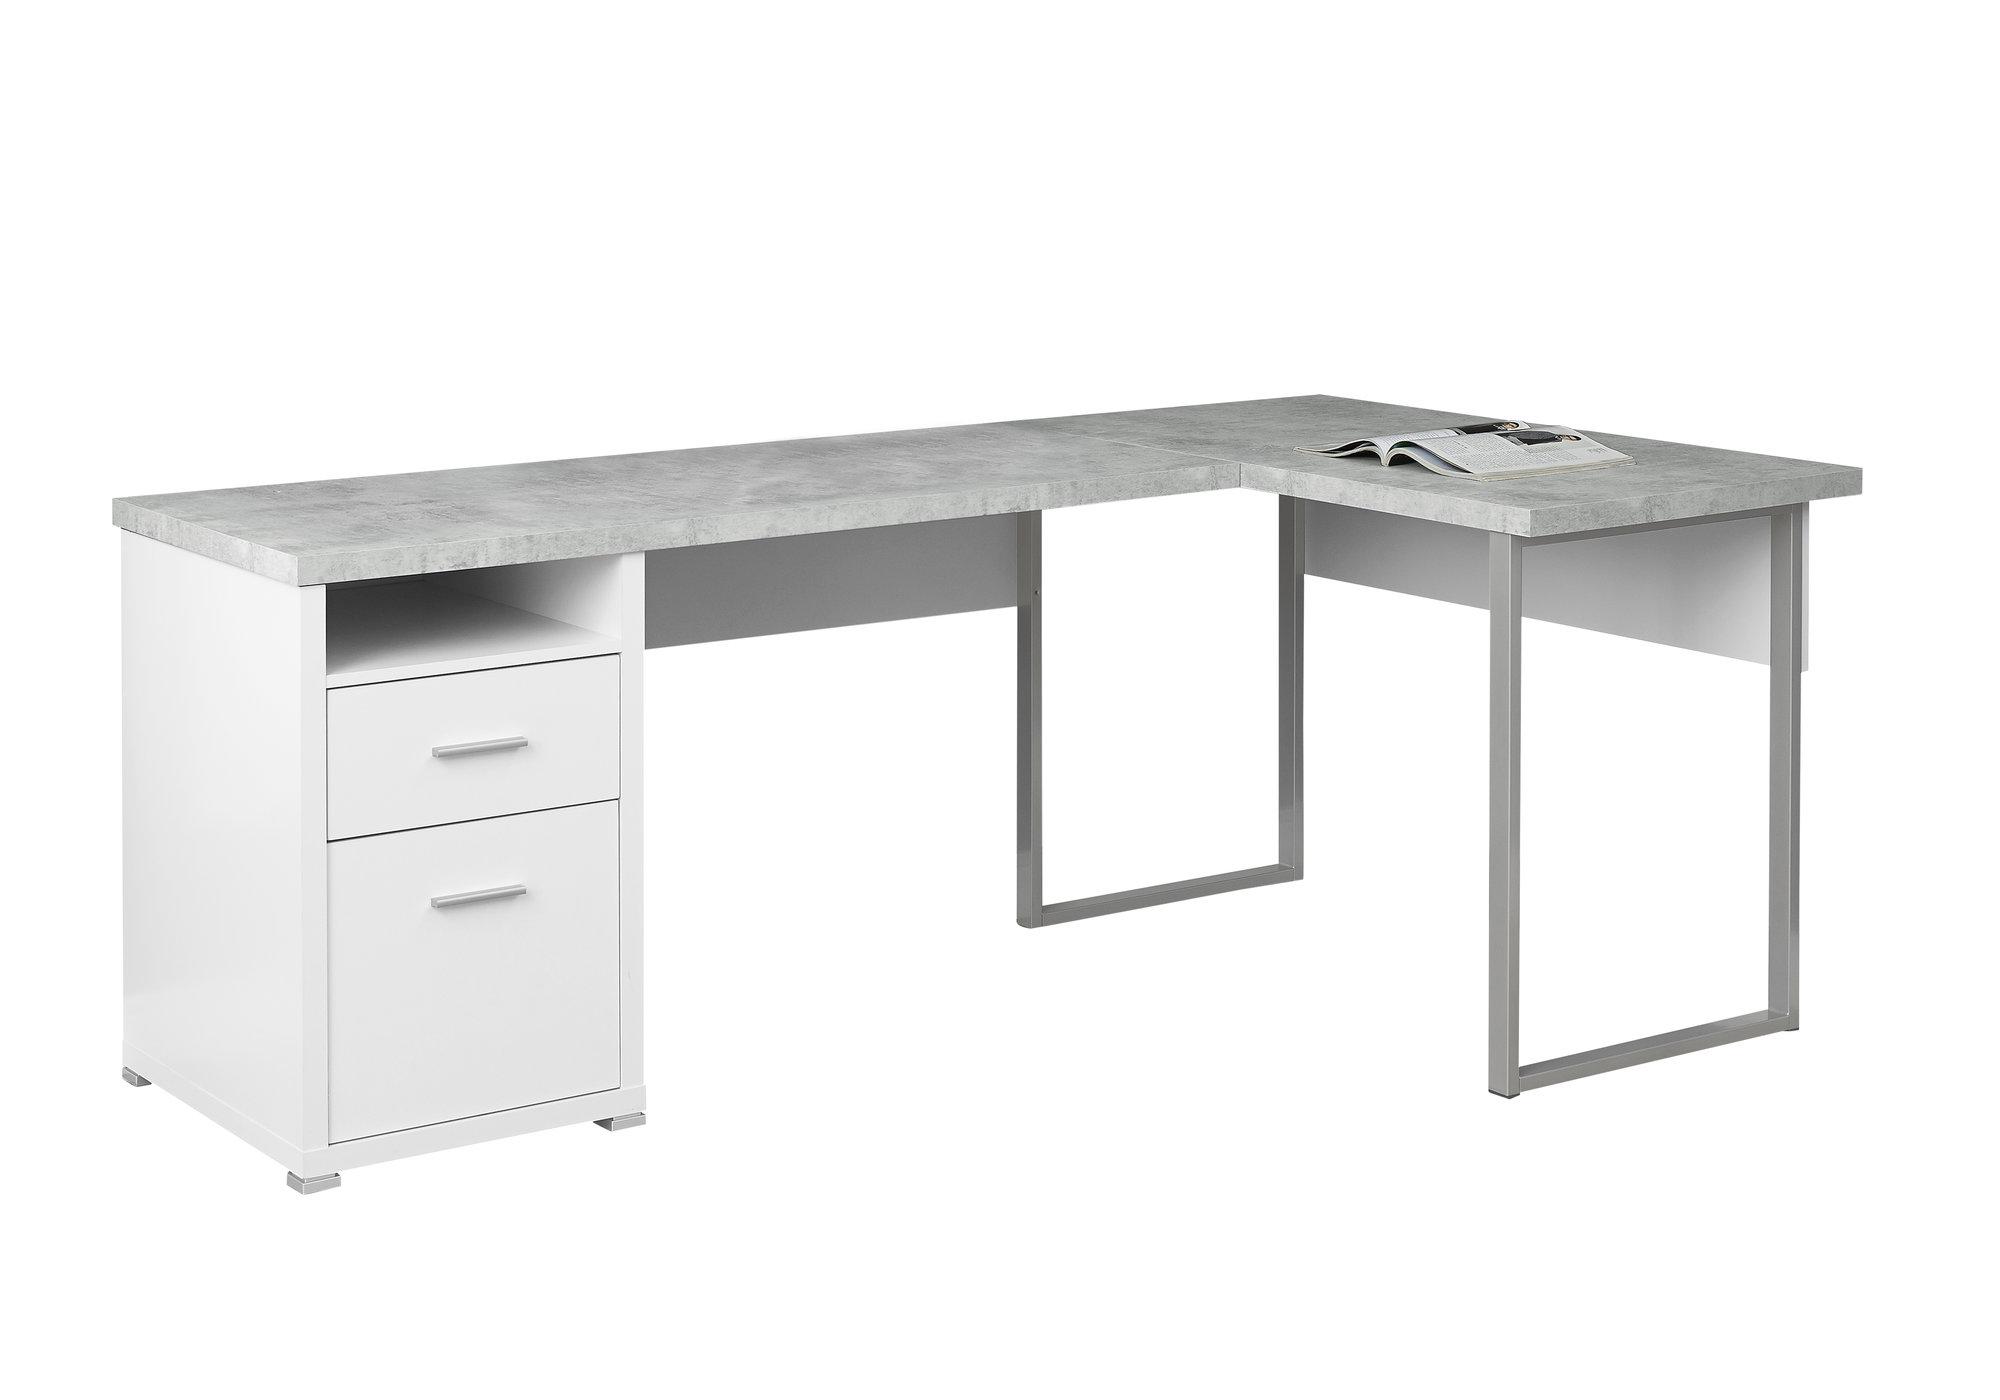 "47"" x 78"" x 30"" White  Grey  Silver  Particle Board  HollowCore  Metal  Computer Desk"